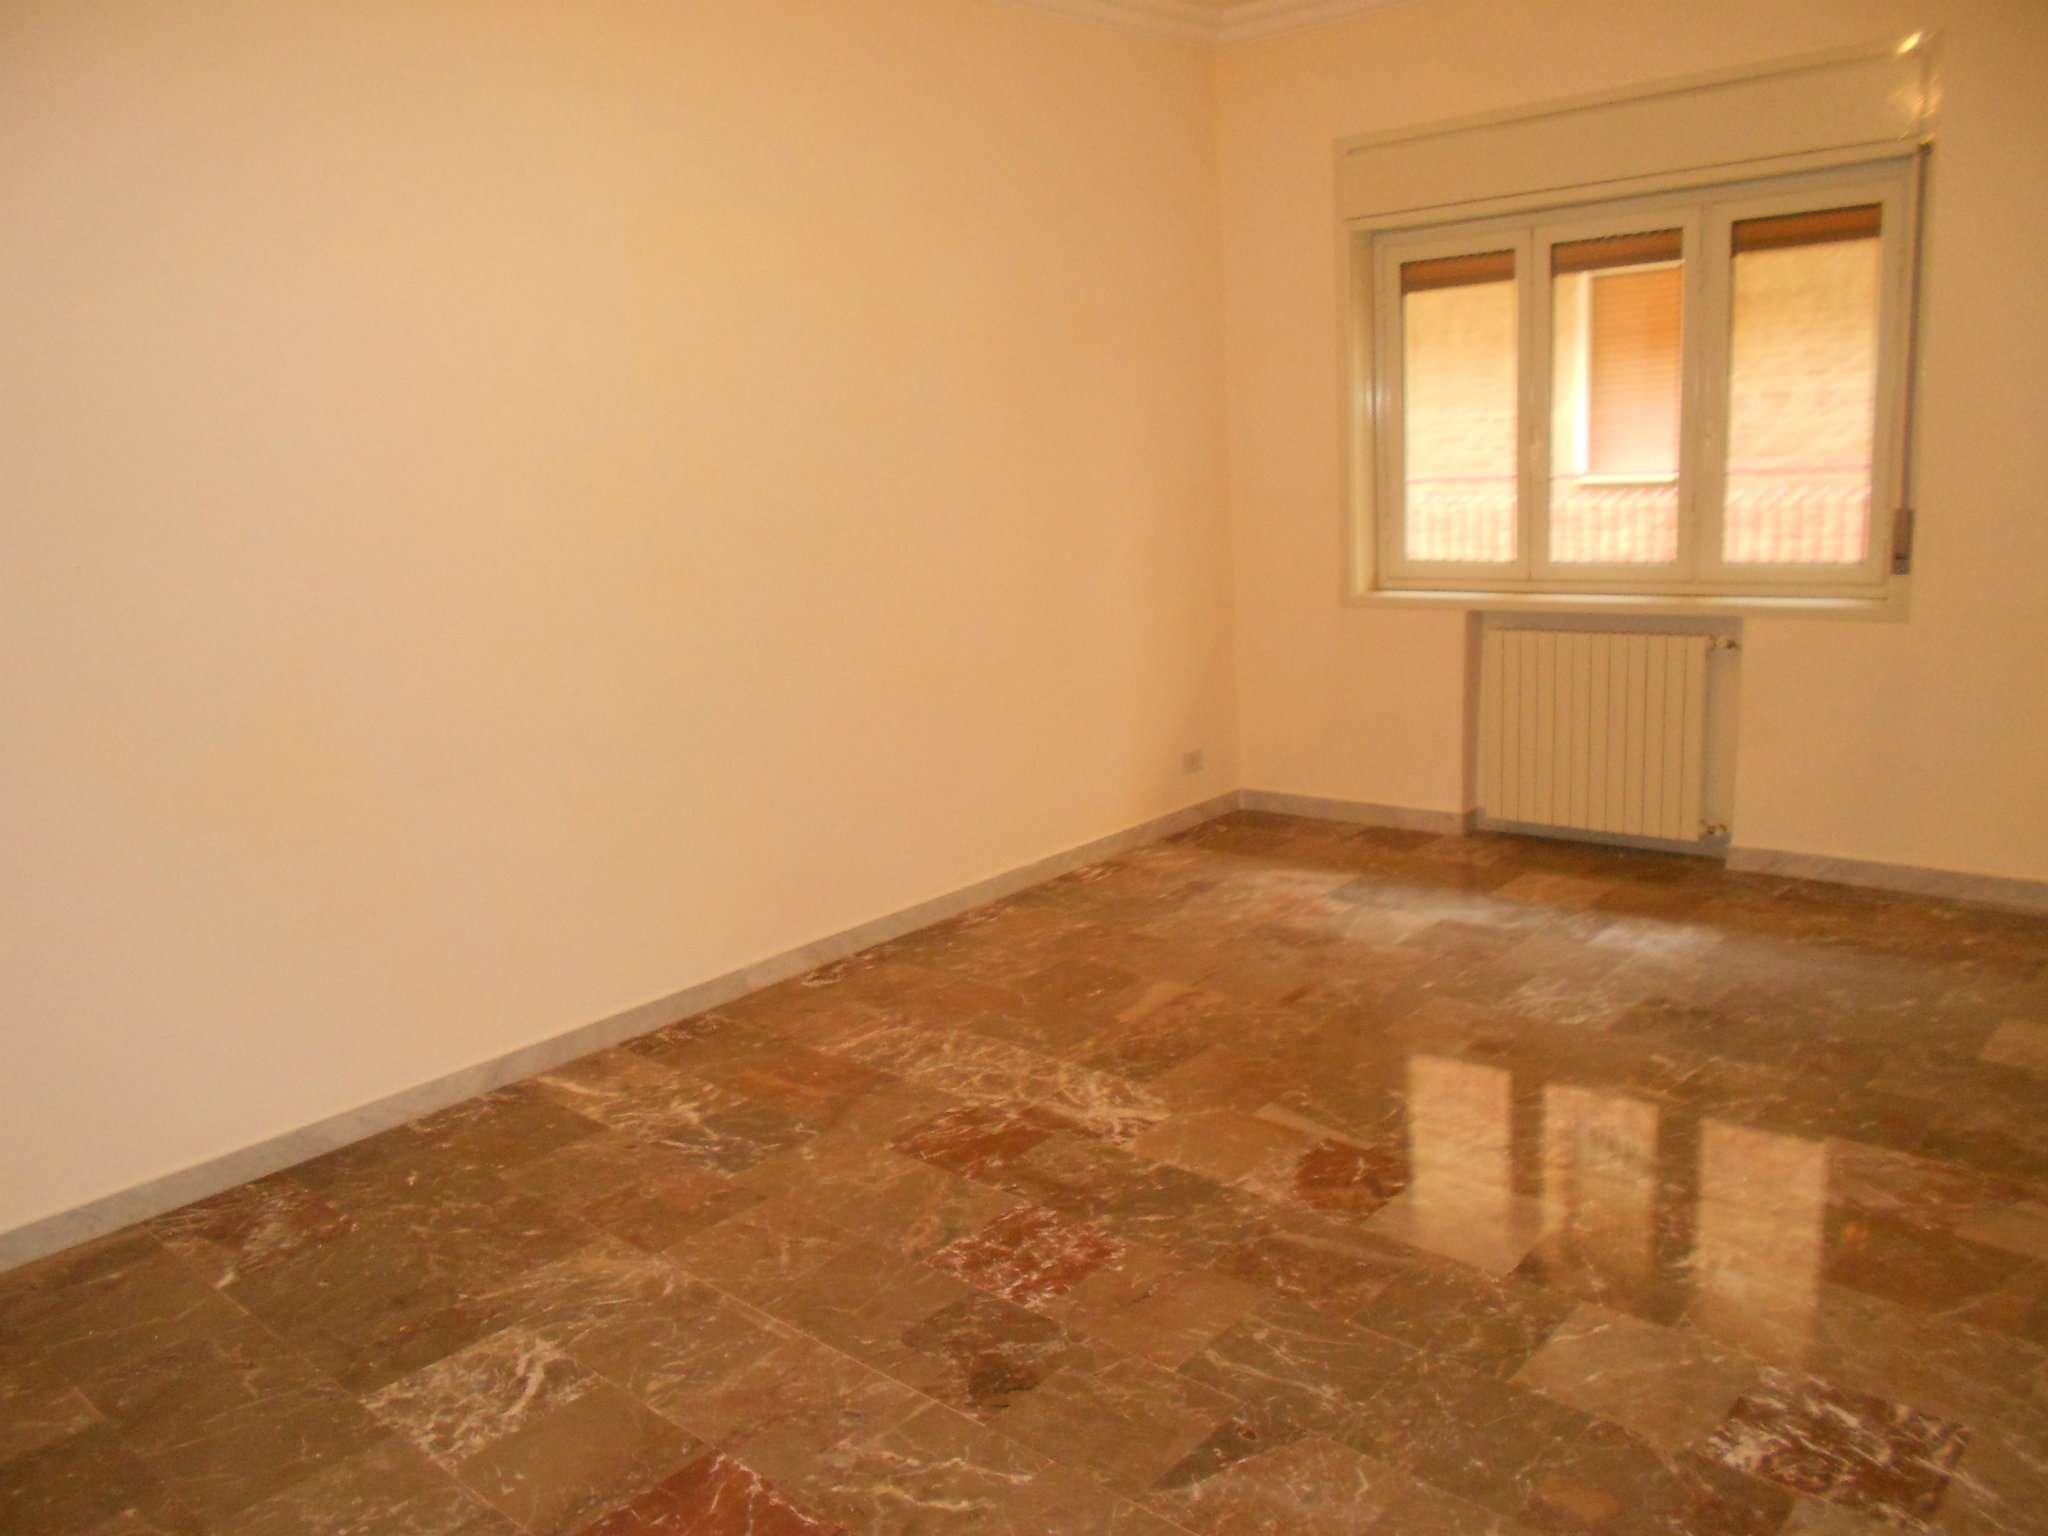 Appartamento 6 locali in vendita a Piazza Armerina (EN)